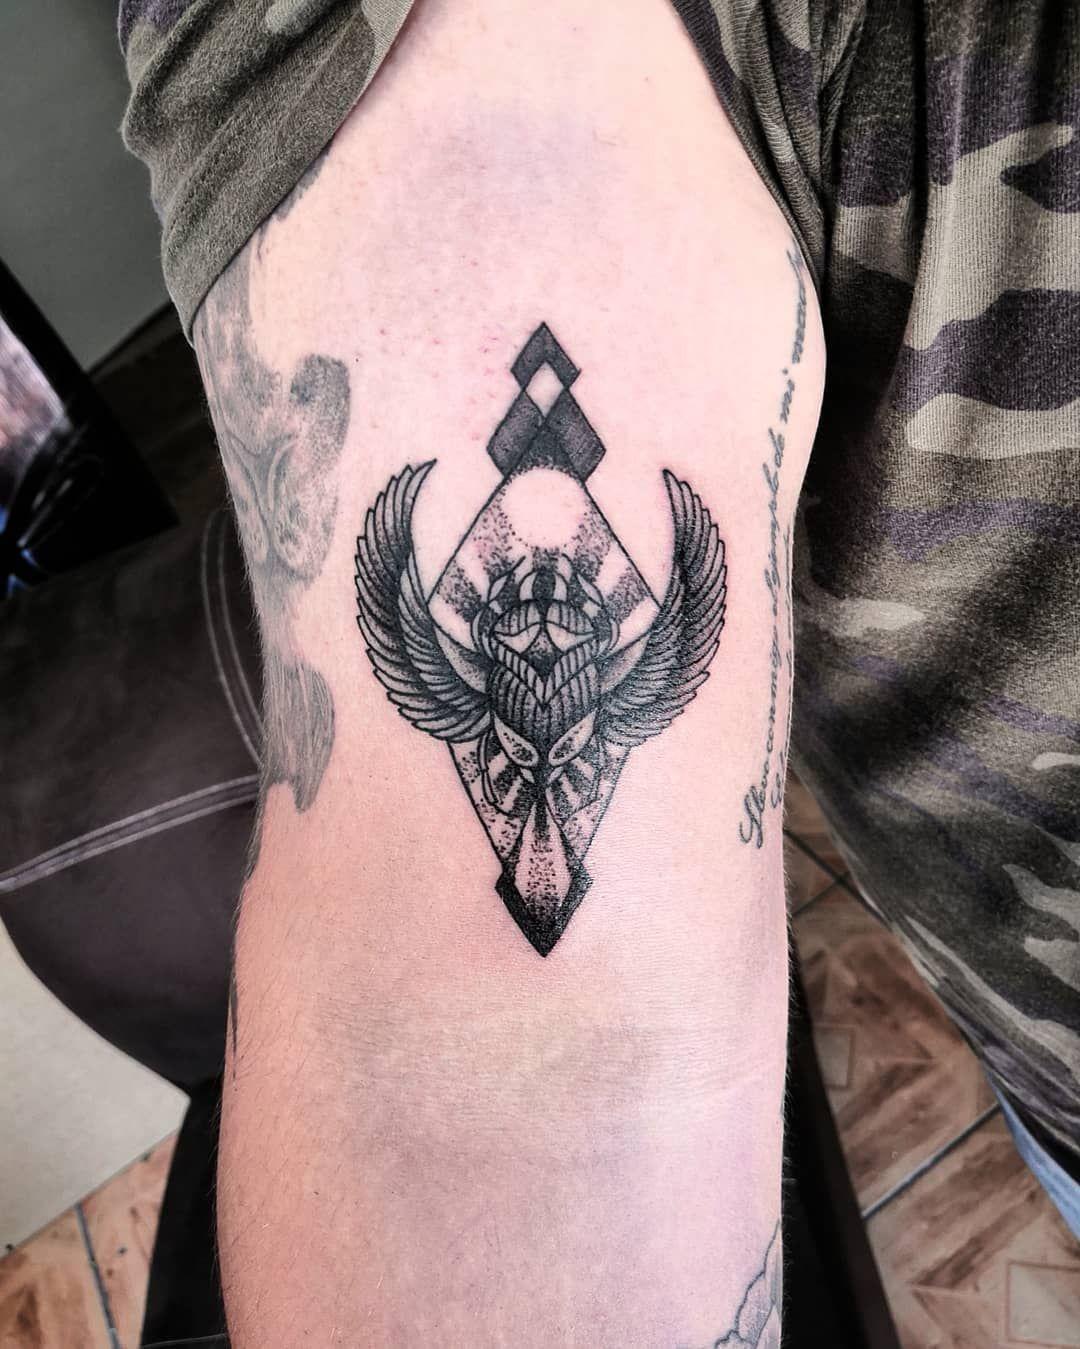 🎴 . . . #beetletattoo #littletattoos #linetattoo #littletattoos #minimalistictattoo #tattoo #tatuagemfeminina #tattoodo #blacktattoo #bigjoetattoo #aprenticetattoo